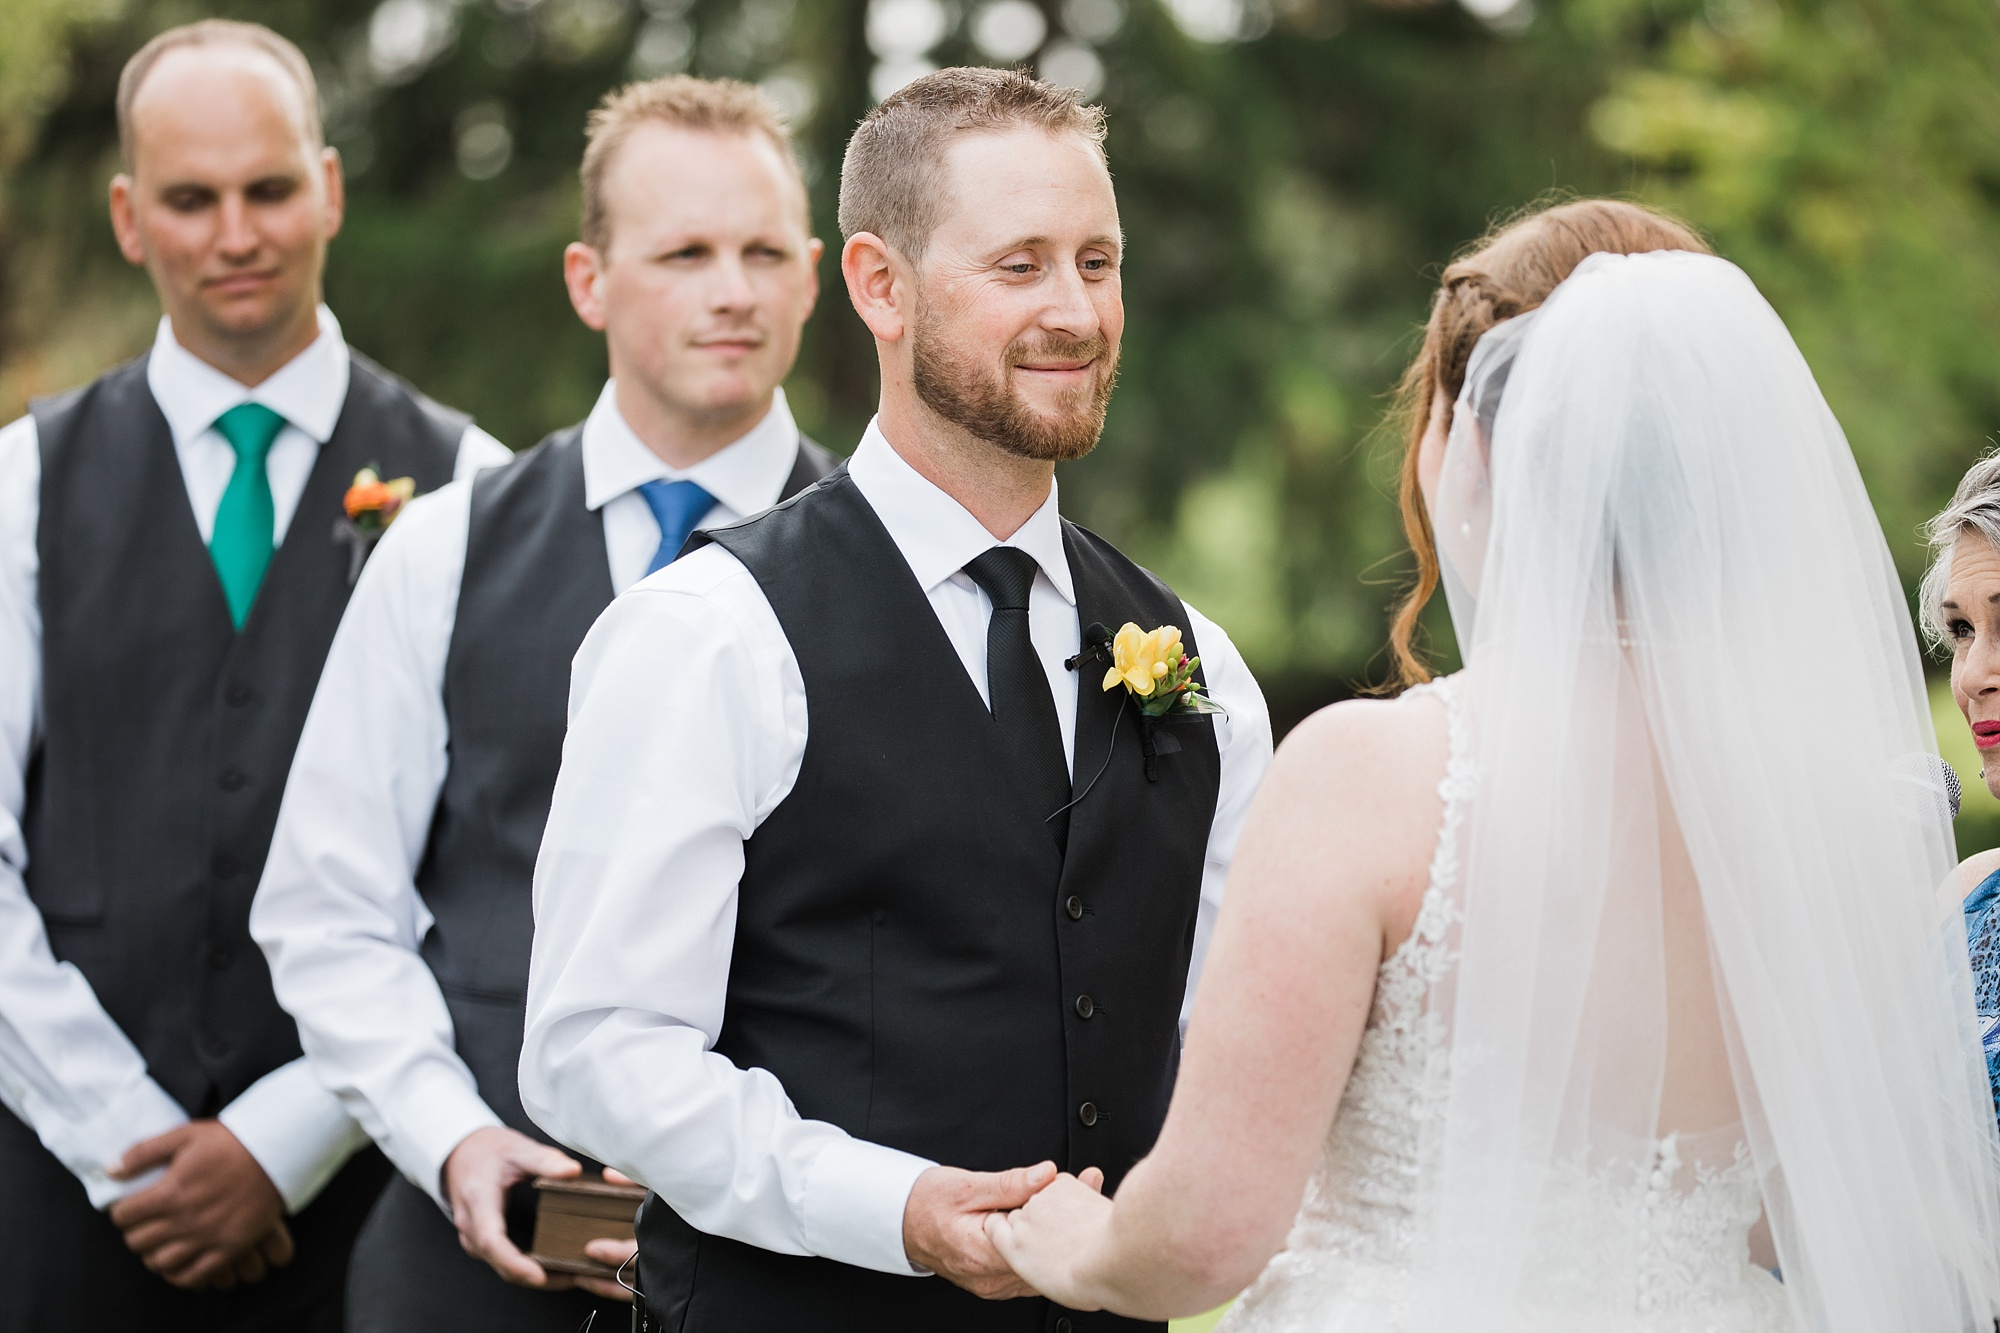 niagarafalls-weddingphotography_0019.jpg